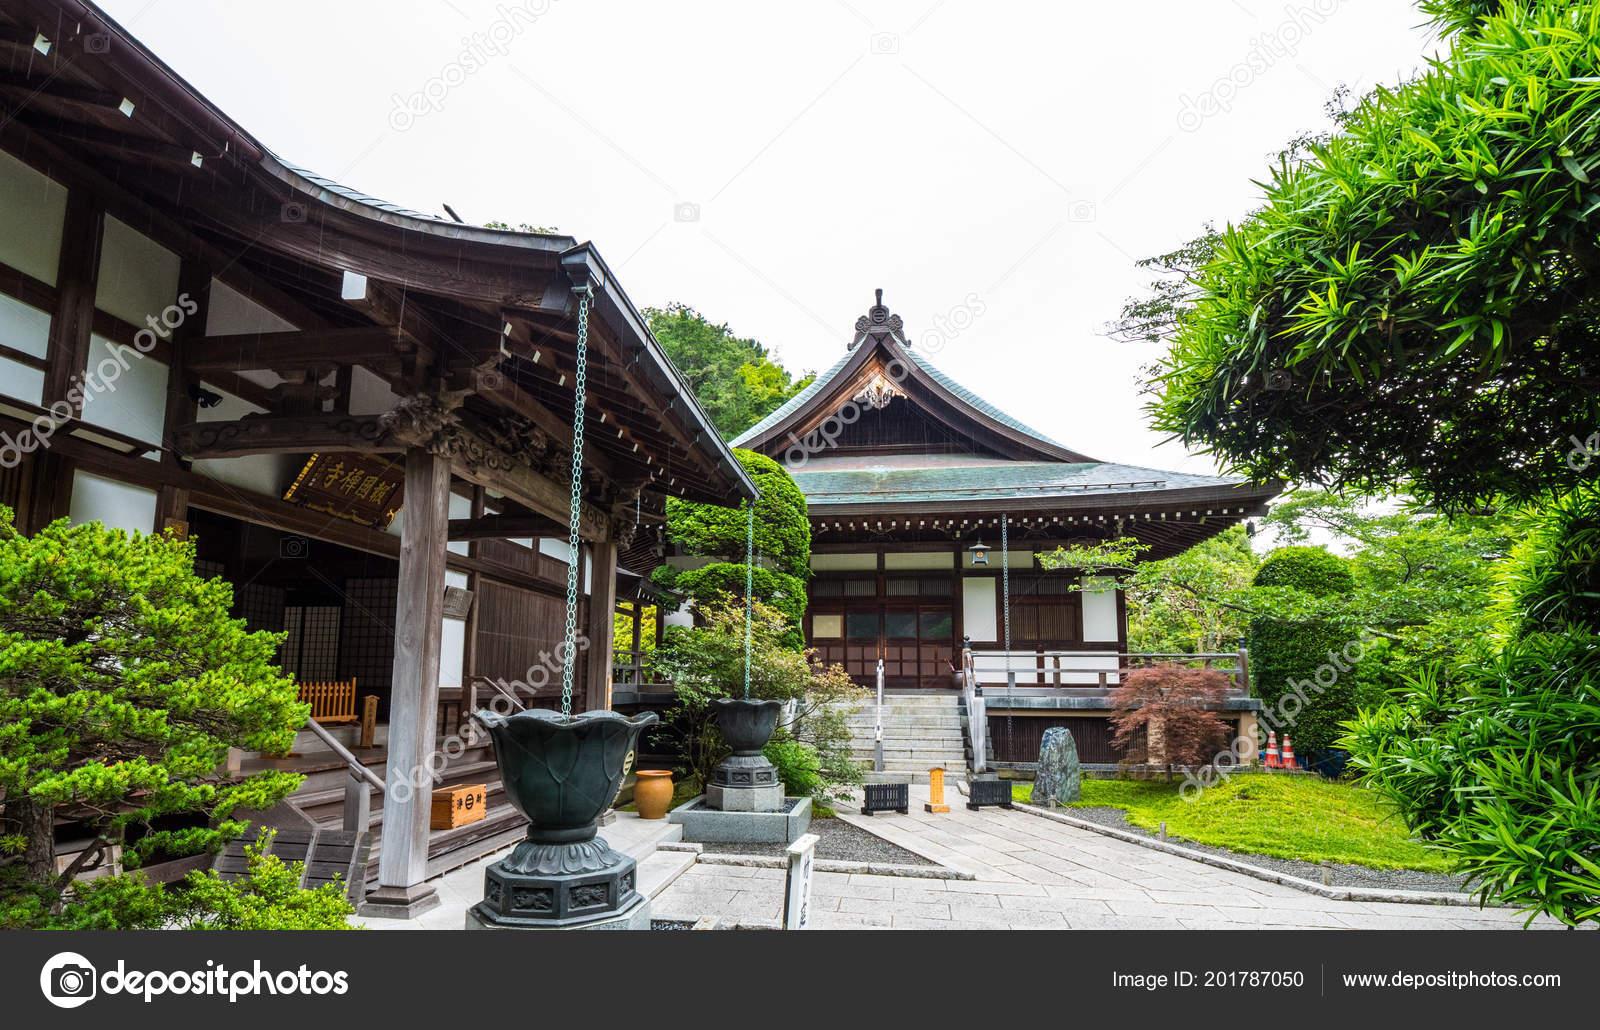 Temple With Japanese Garden In Kamakura Tokyo Japan June 17